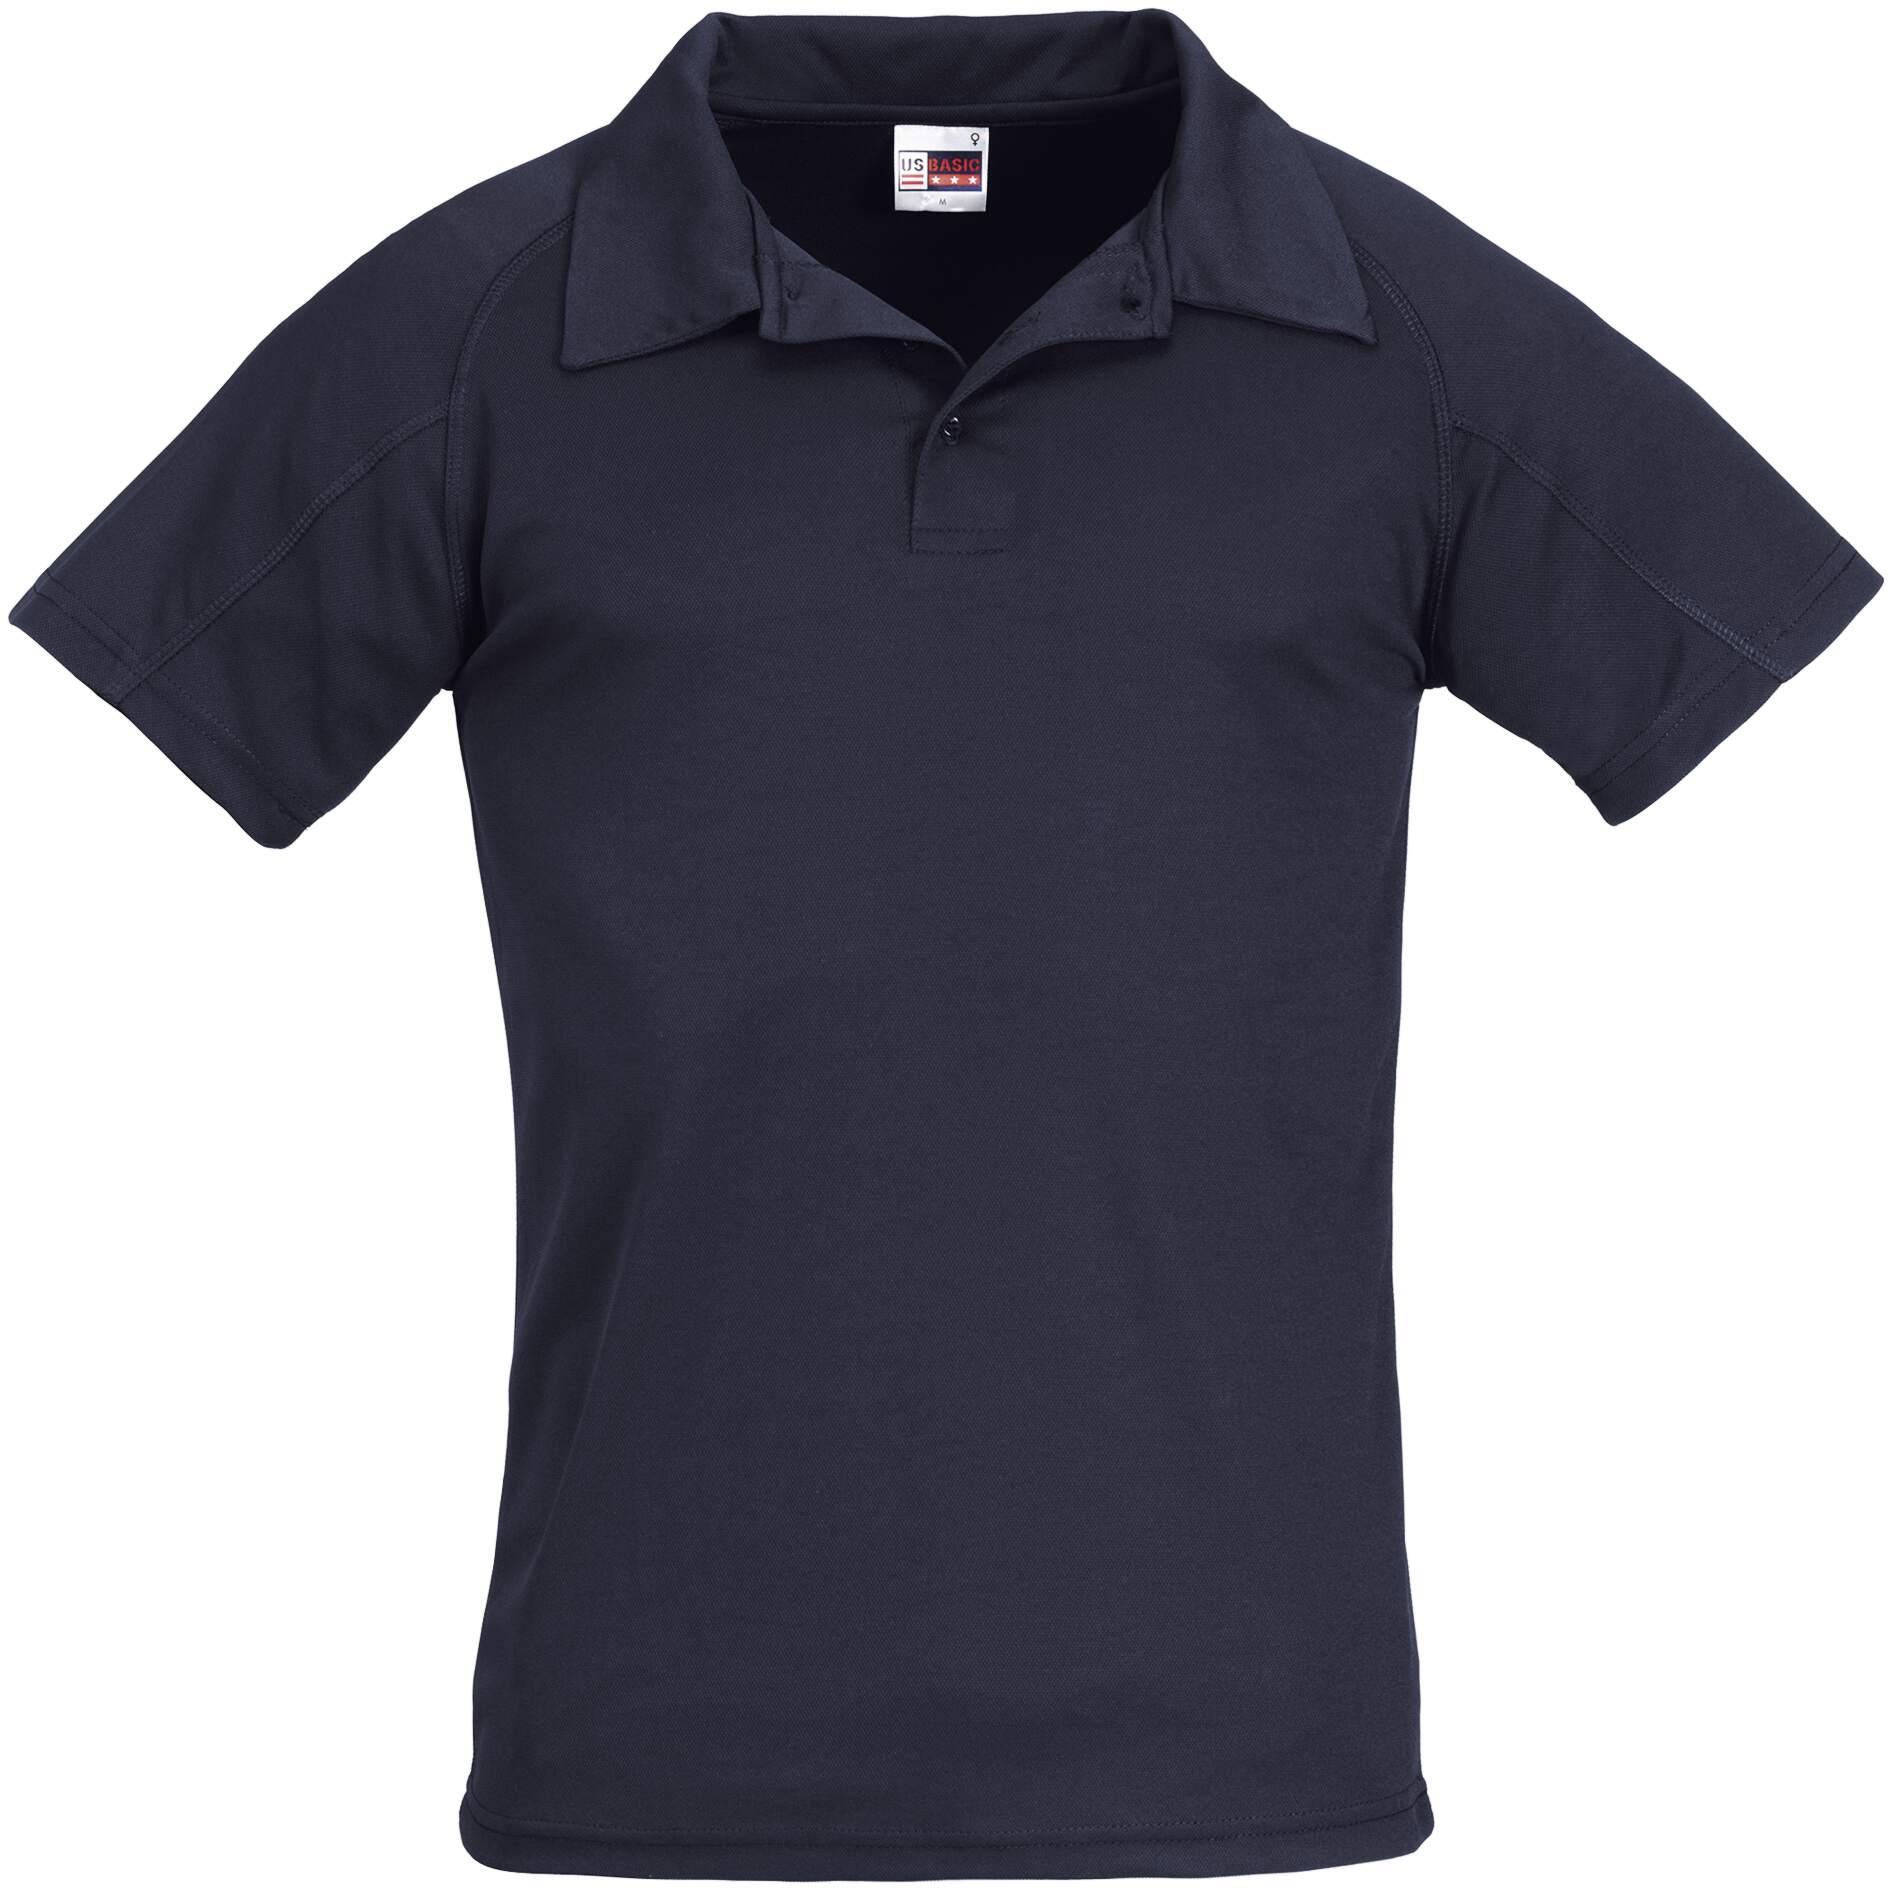 Koszulki Polo US 31098 Cool Fit - 31098_granatowy_US - Kolor: Granatowy